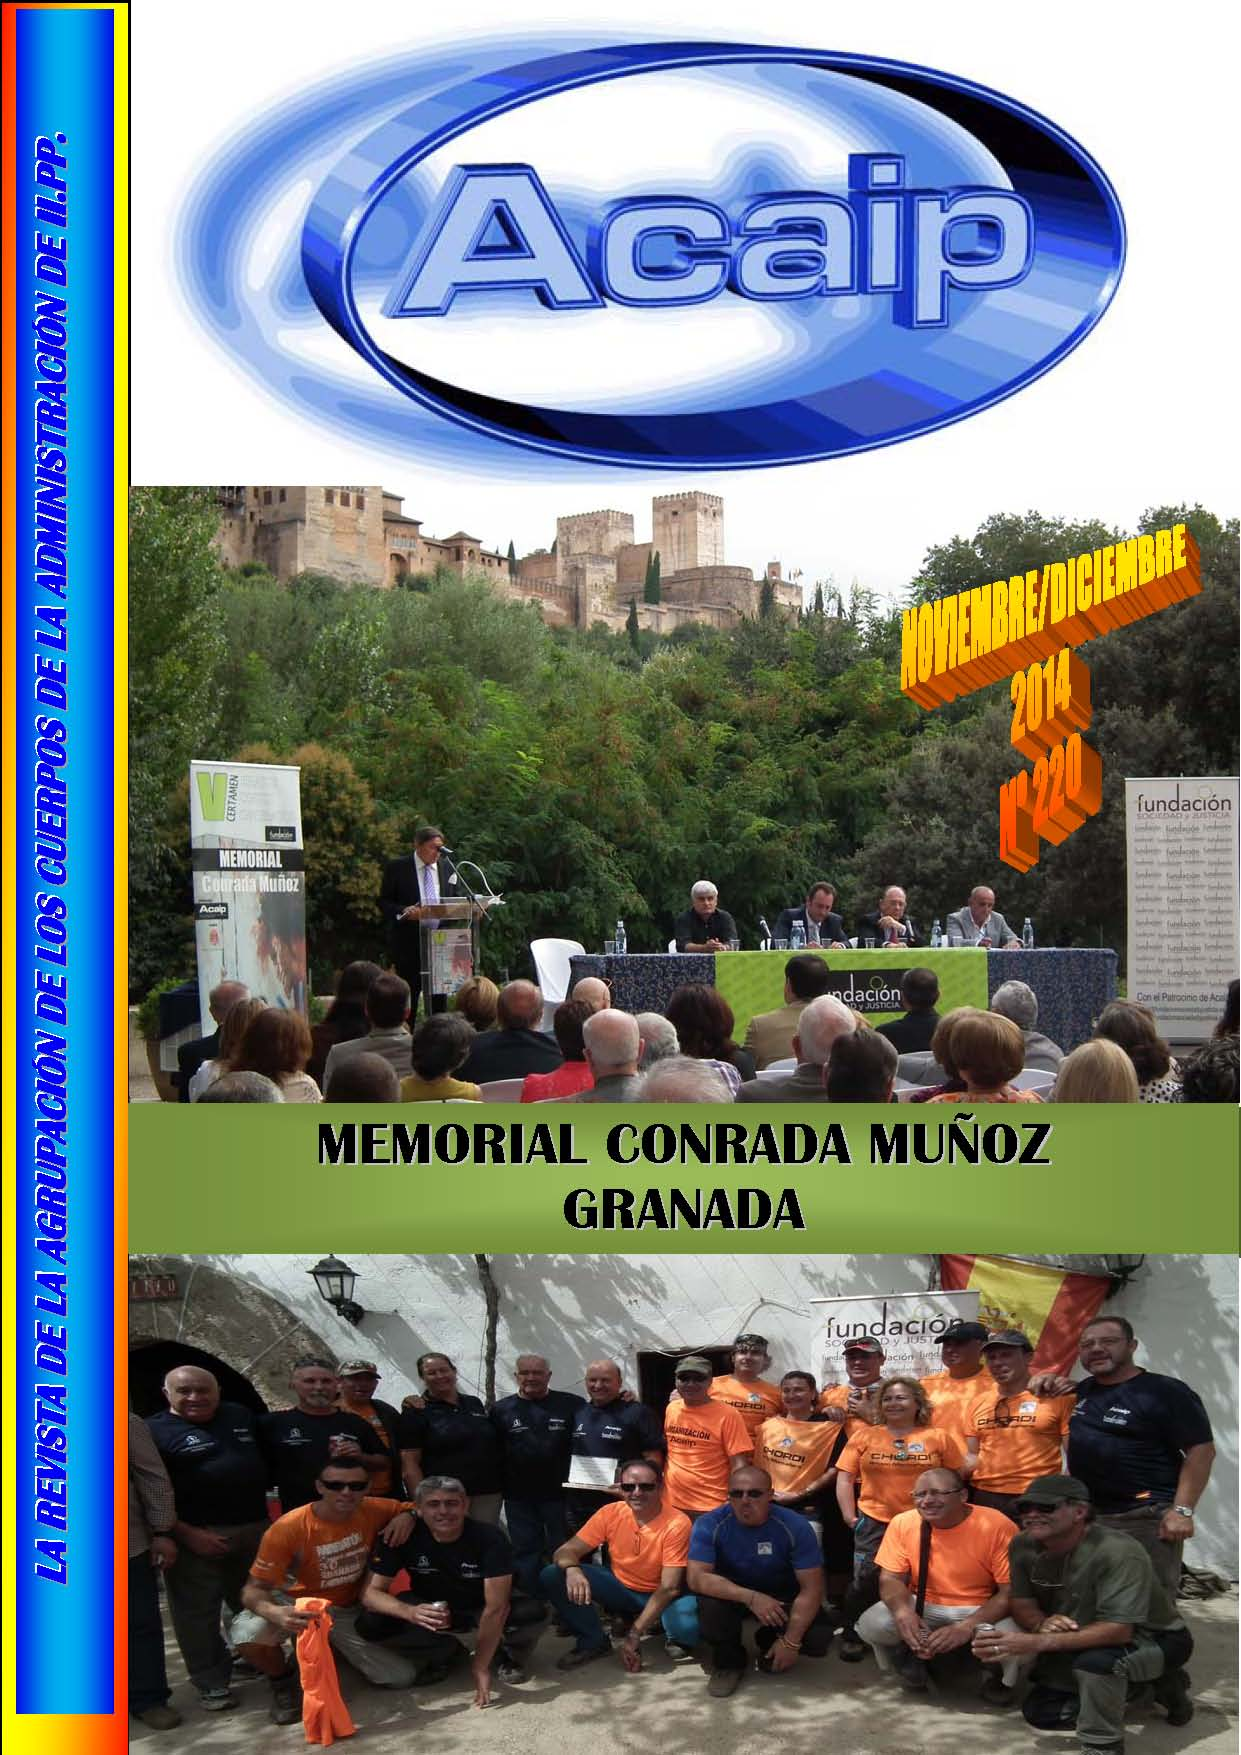 V MEMORIAL CONRADA MUÑOZ CELEBRADO EN GRANADA